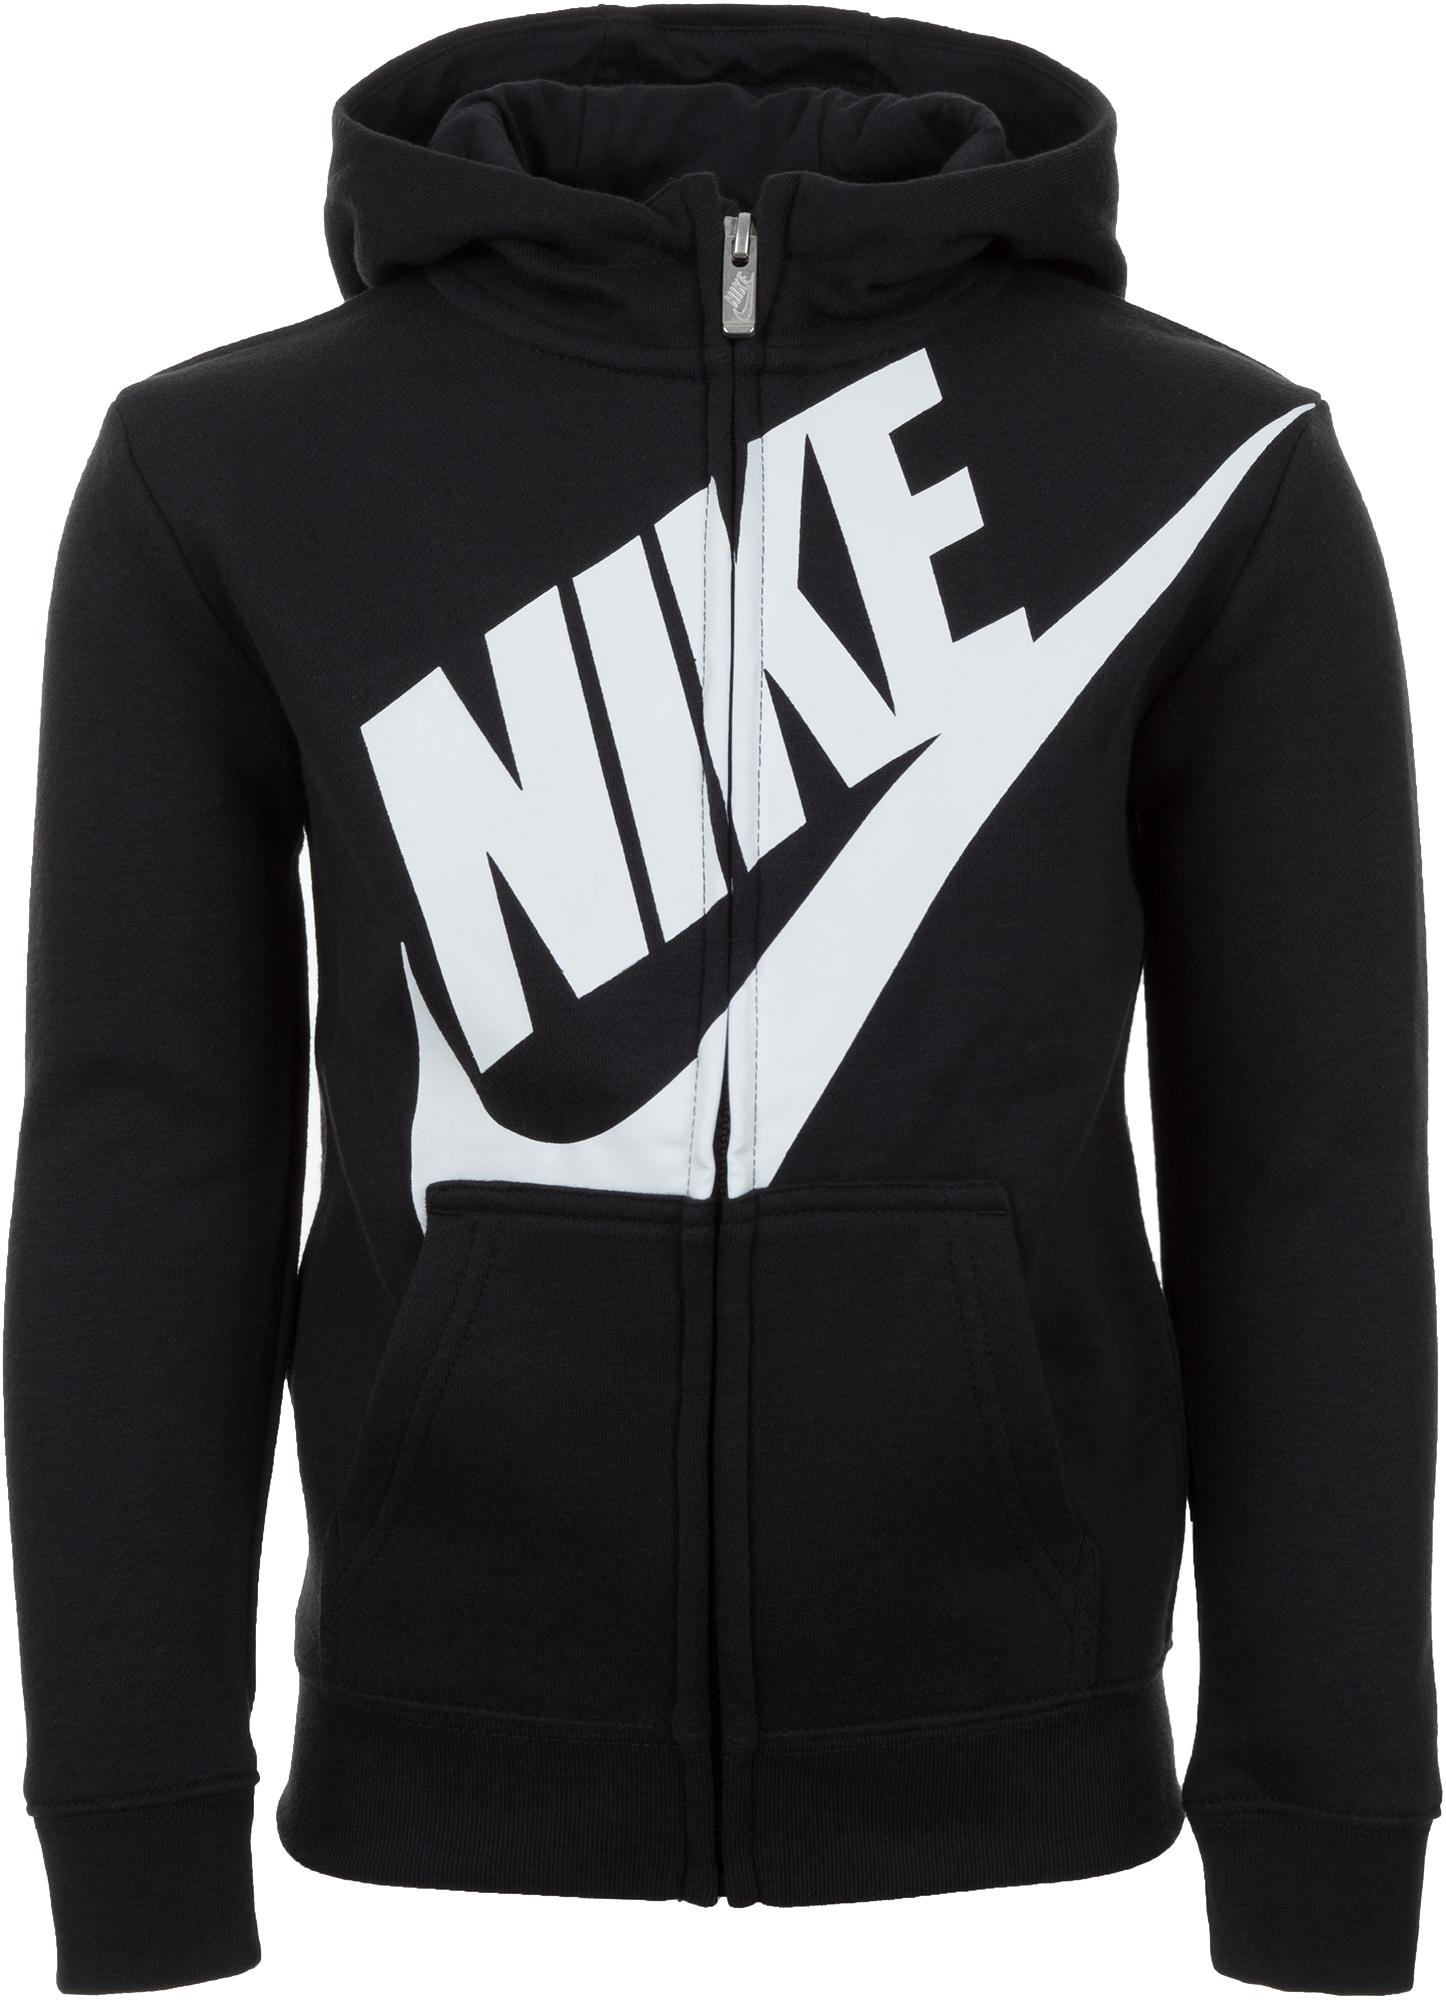 цена на Nike Толстовка для мальчиков Nike, размер 122